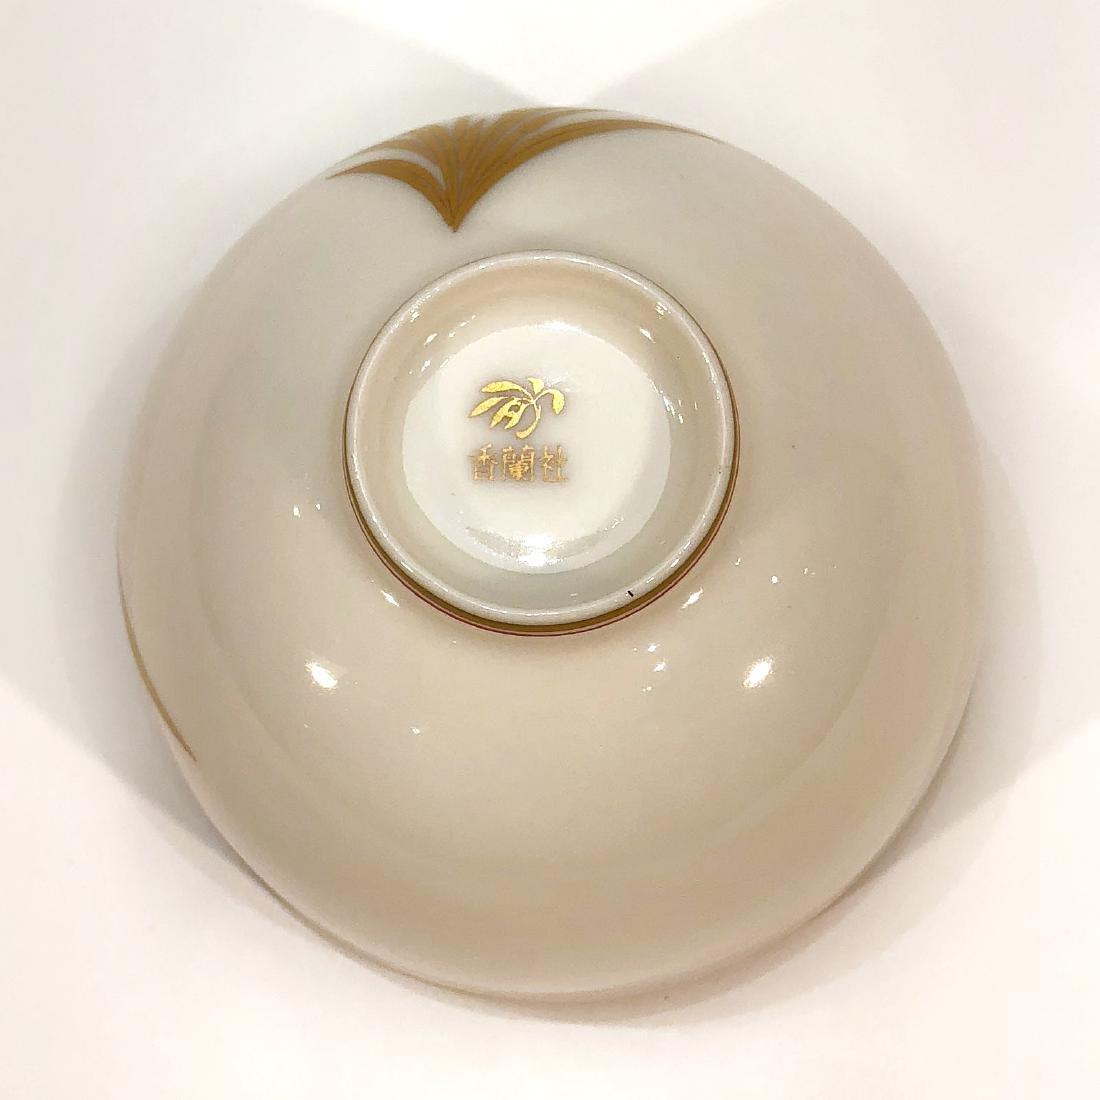 Set of 10 Japanese Porcelain Tea Cups - 3